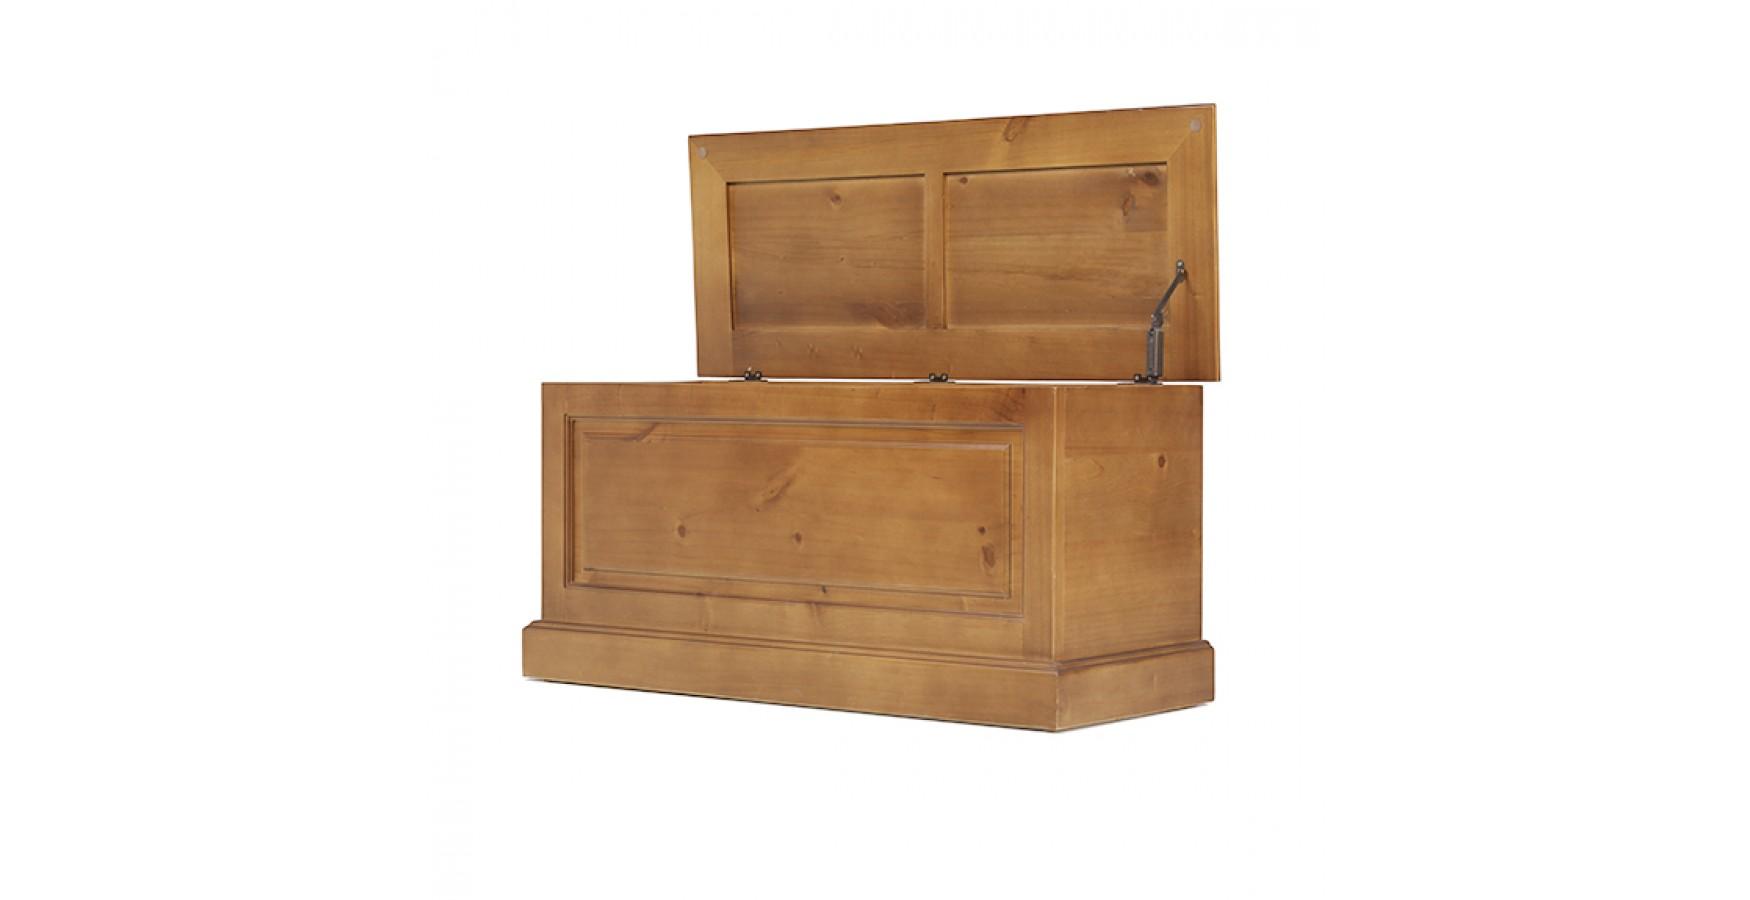 Country Pine Blanket Box Lifestyle Furniture Uk